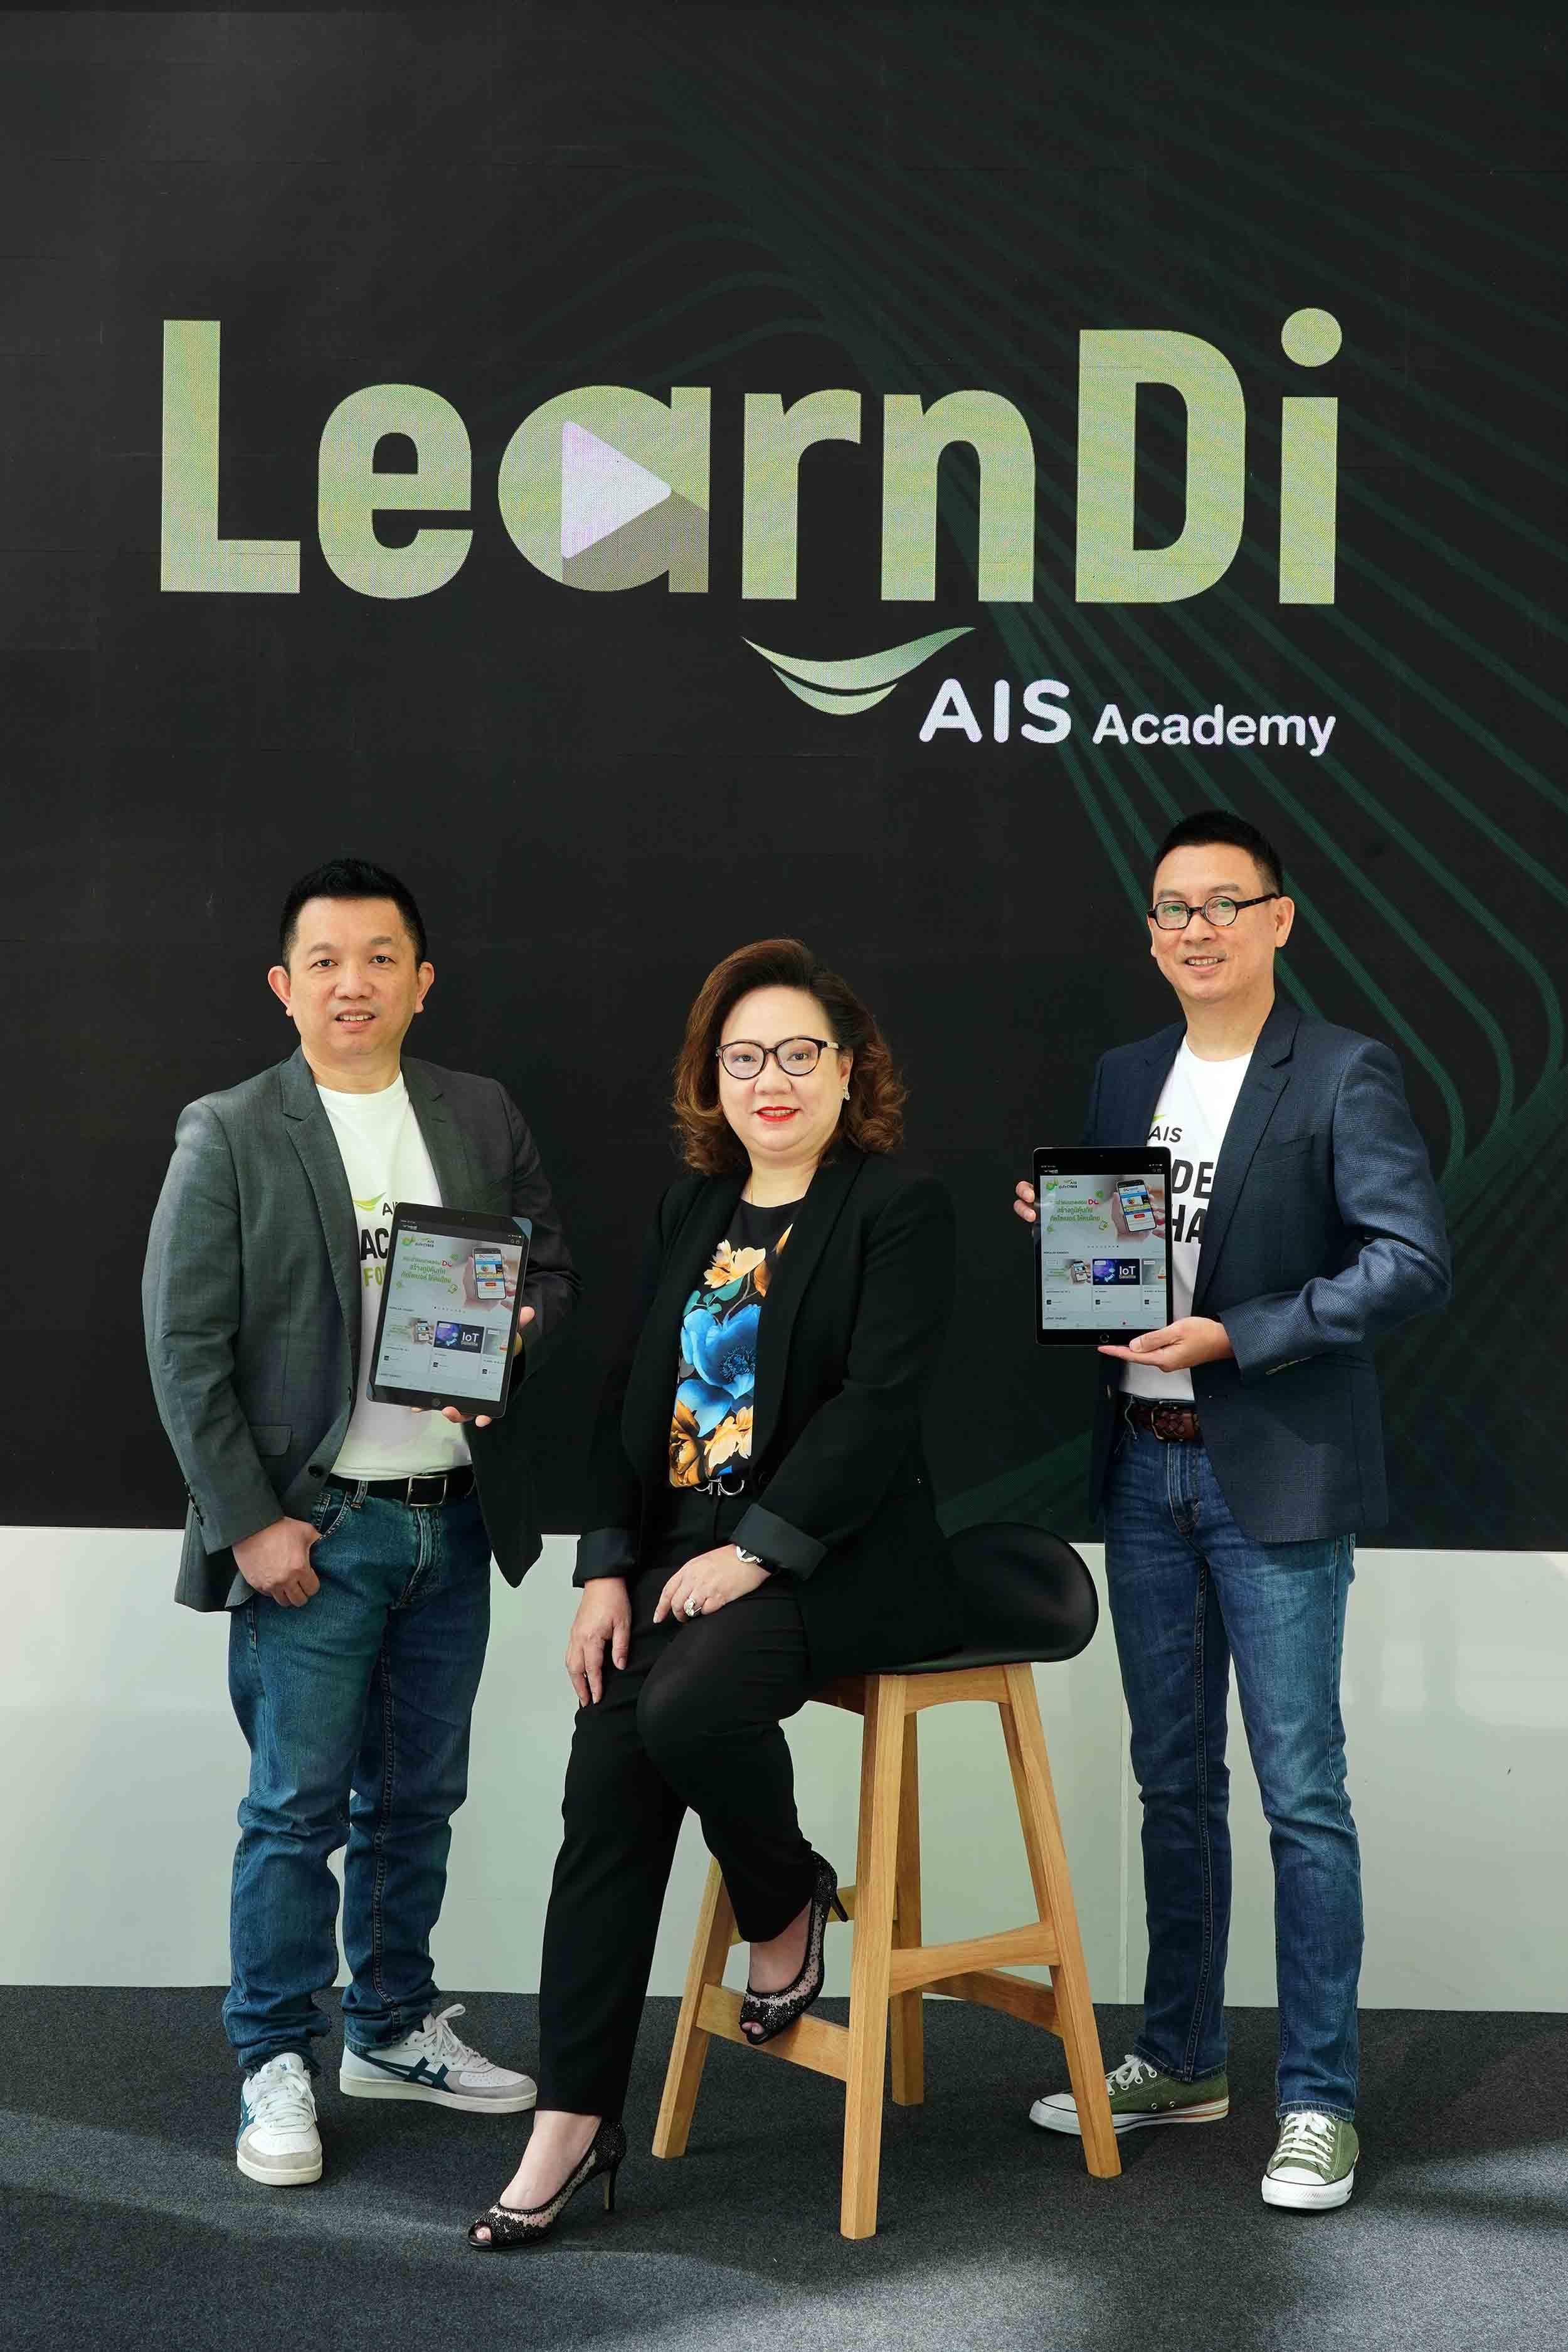 "AIS Academy"" พร้อมพันธมิตรชั้นนำแวดวง ""EdTech"" ต่อยอดหนุนผู้ประกอบการผุด ""LearnDi"